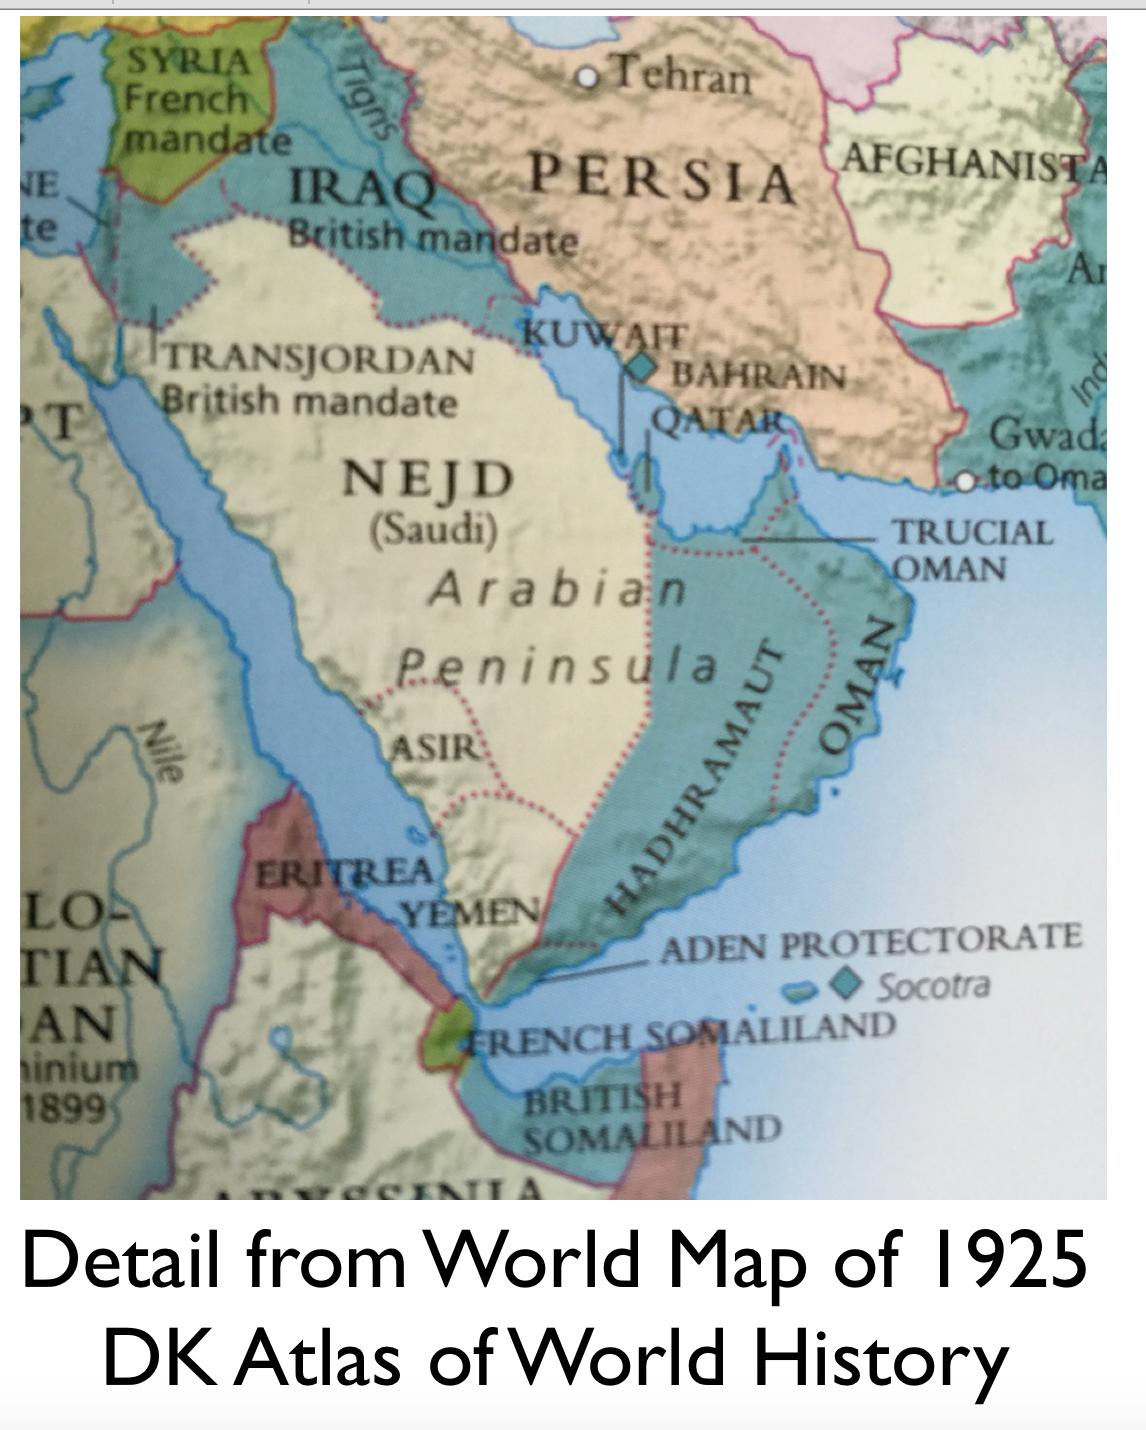 Forgotten Modern Kingdoms of the Arabian Peninsula Part 1 – Arabian Peninsula World Map